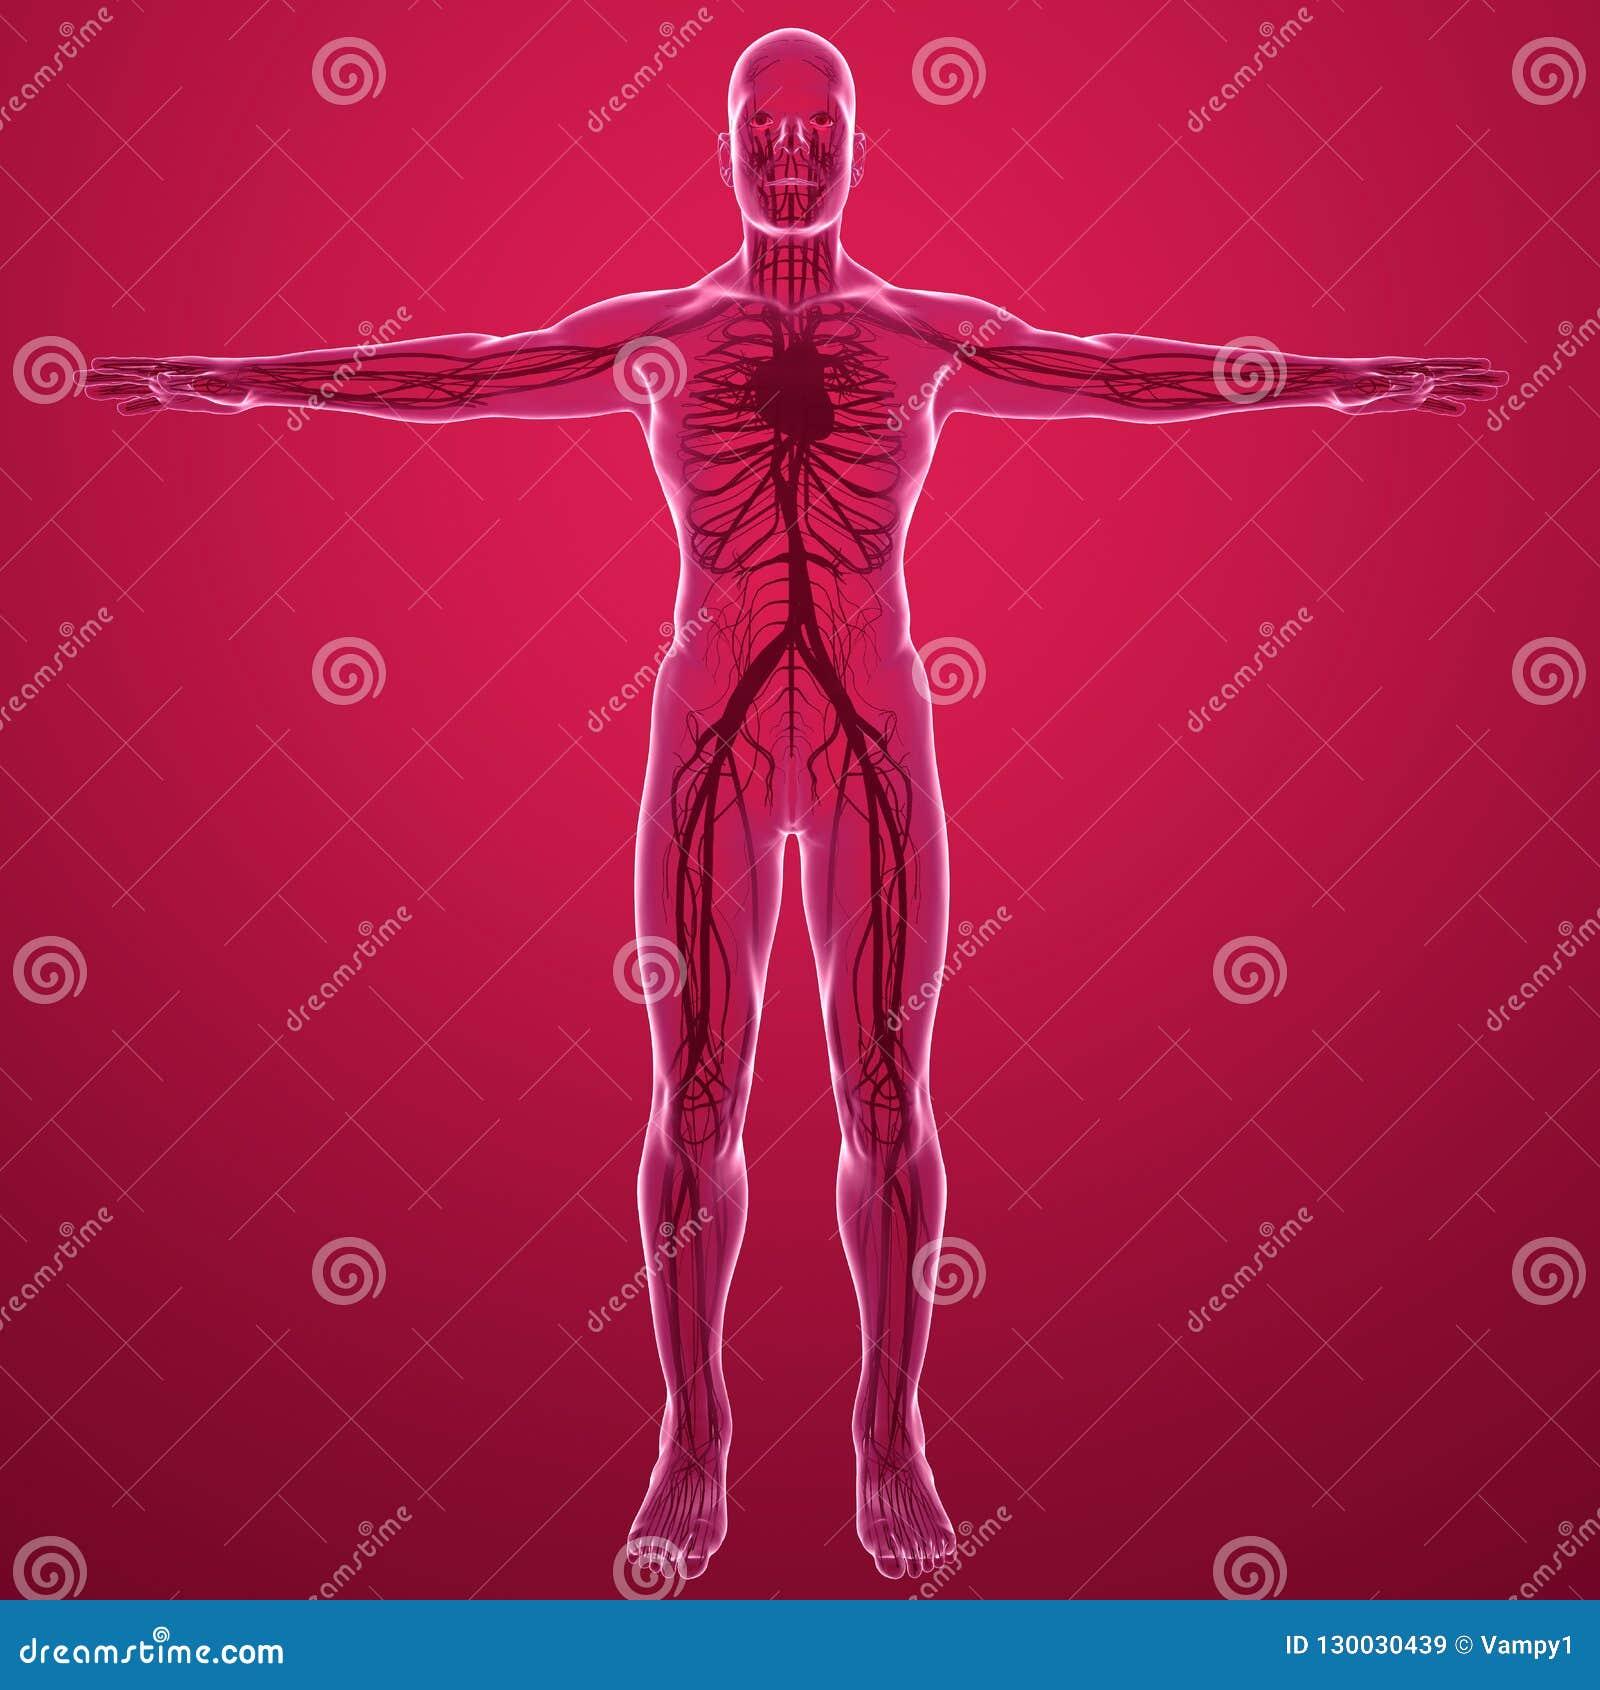 Menselijk lichaams x-ray mening van het vaatstelsel met hartslagaders en aders